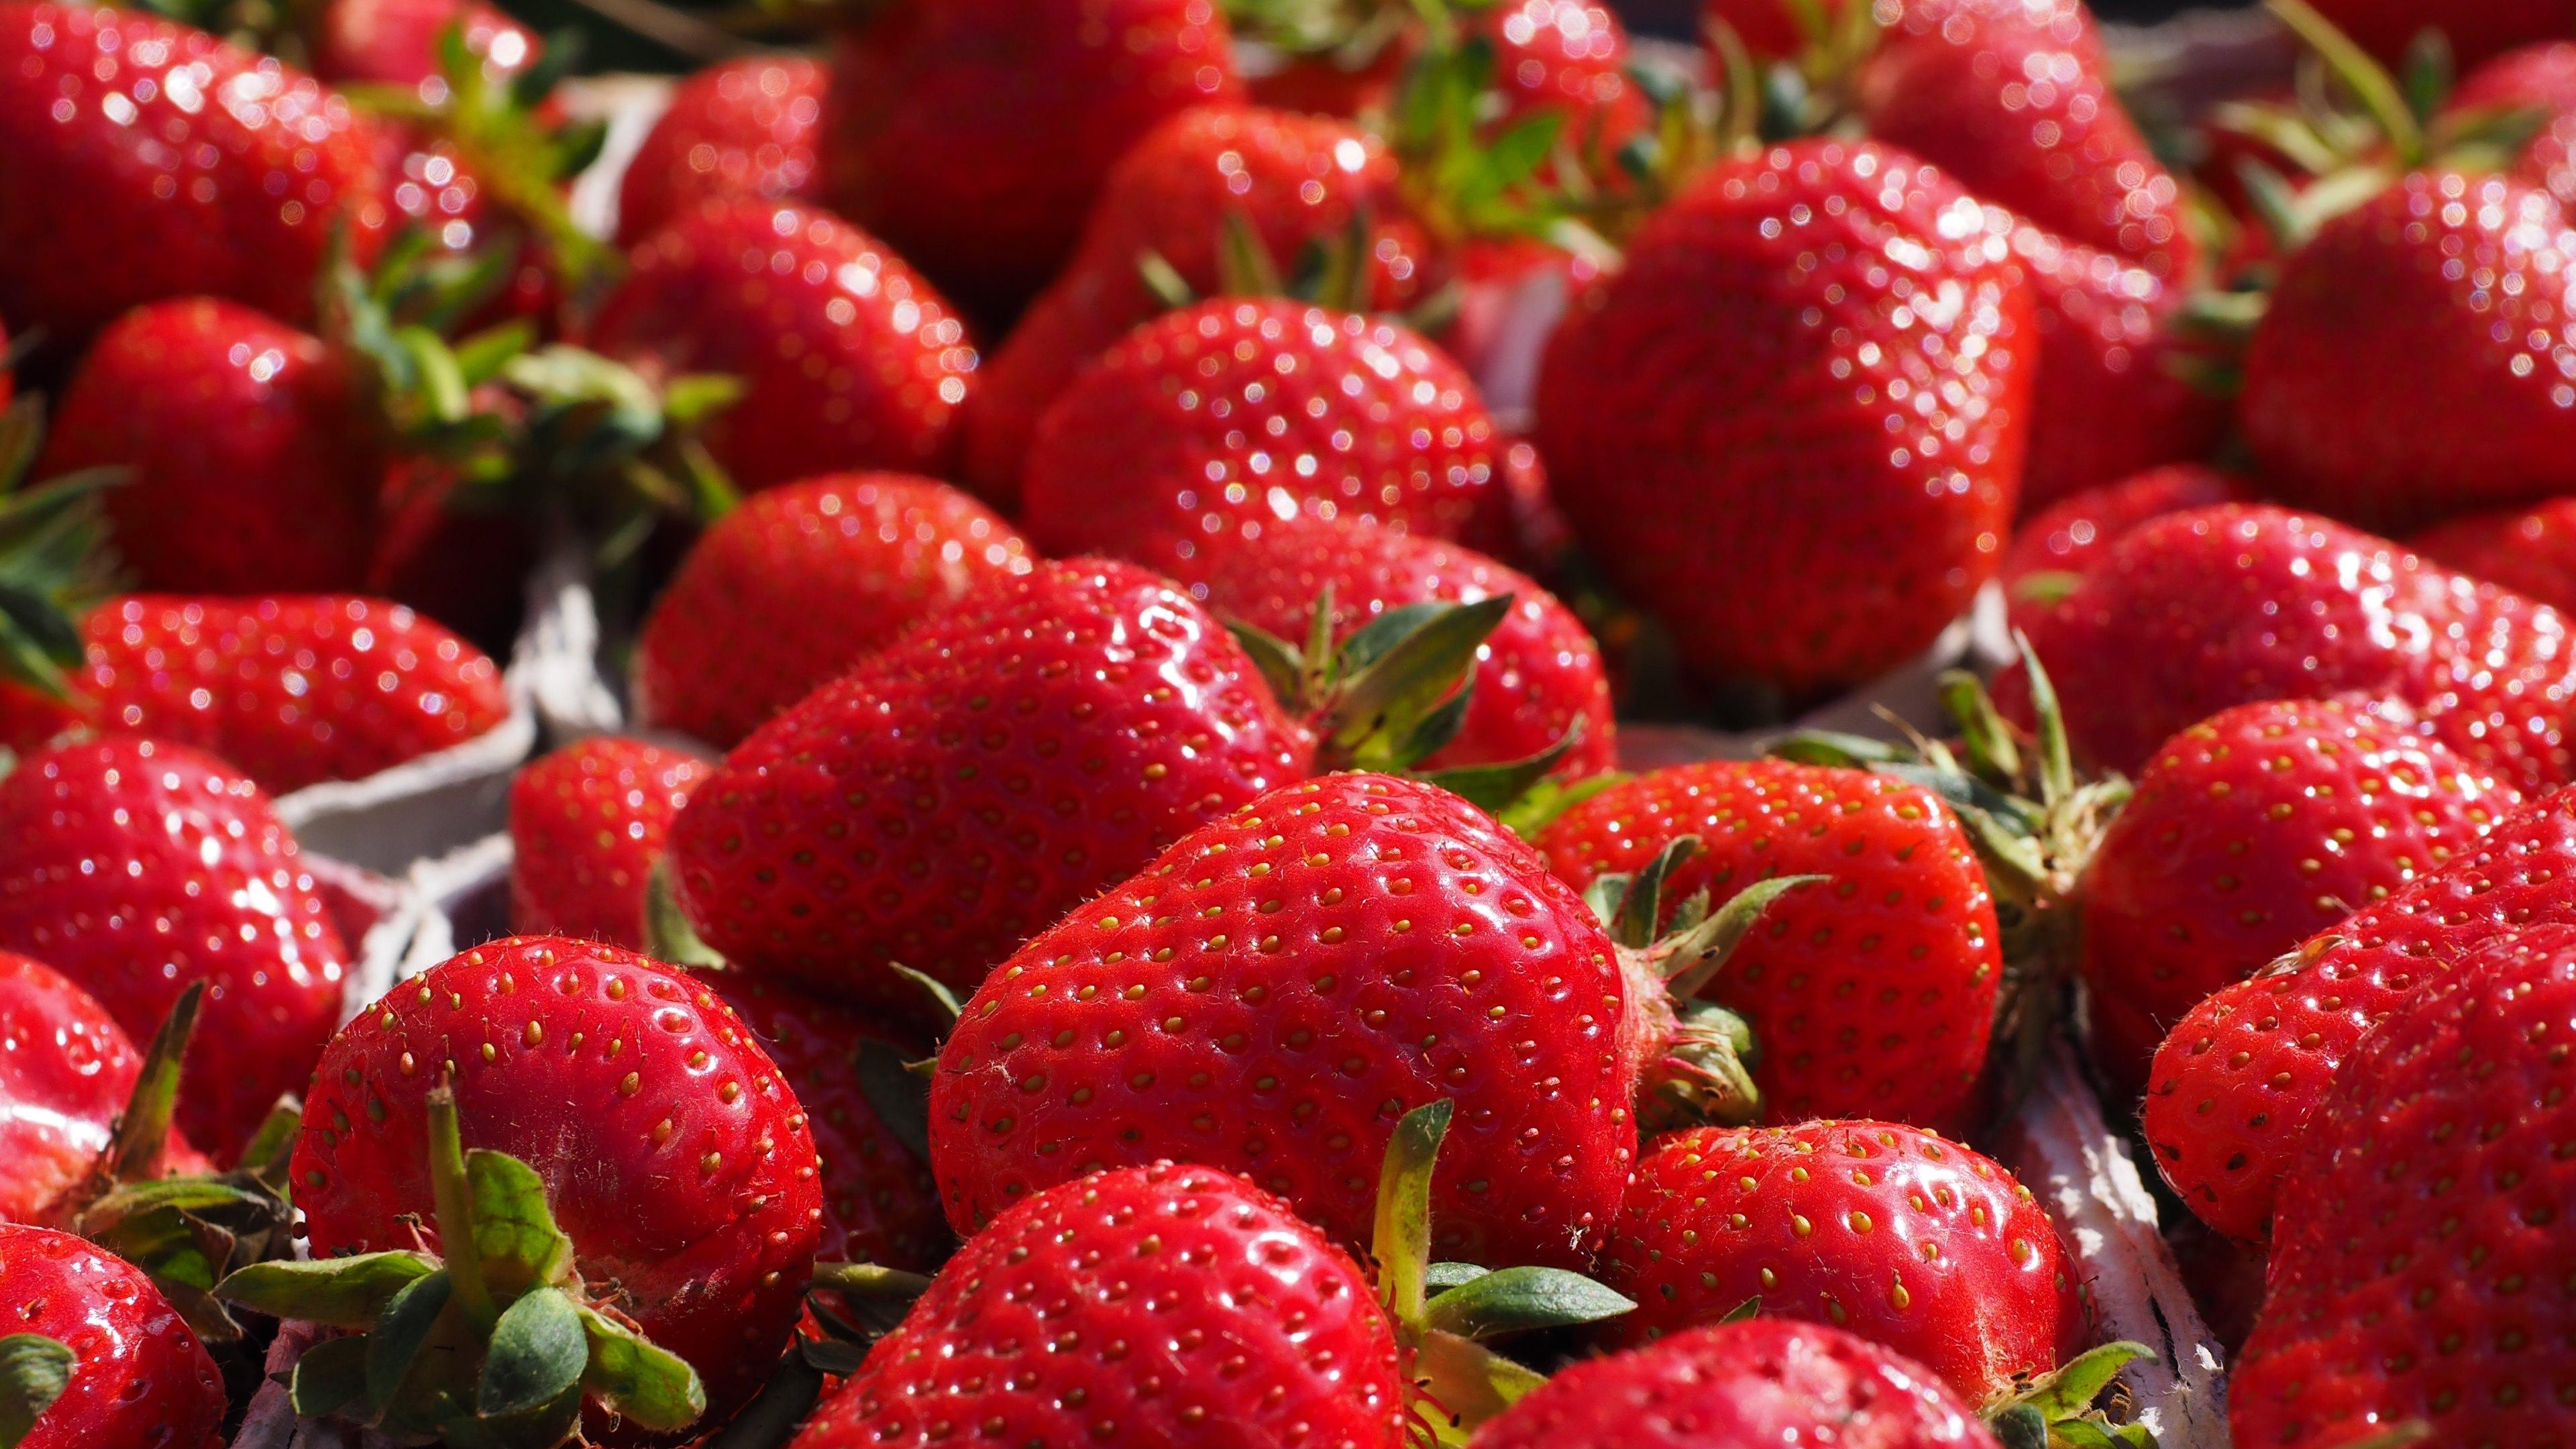 Wallpaper: Fresh Strawberries